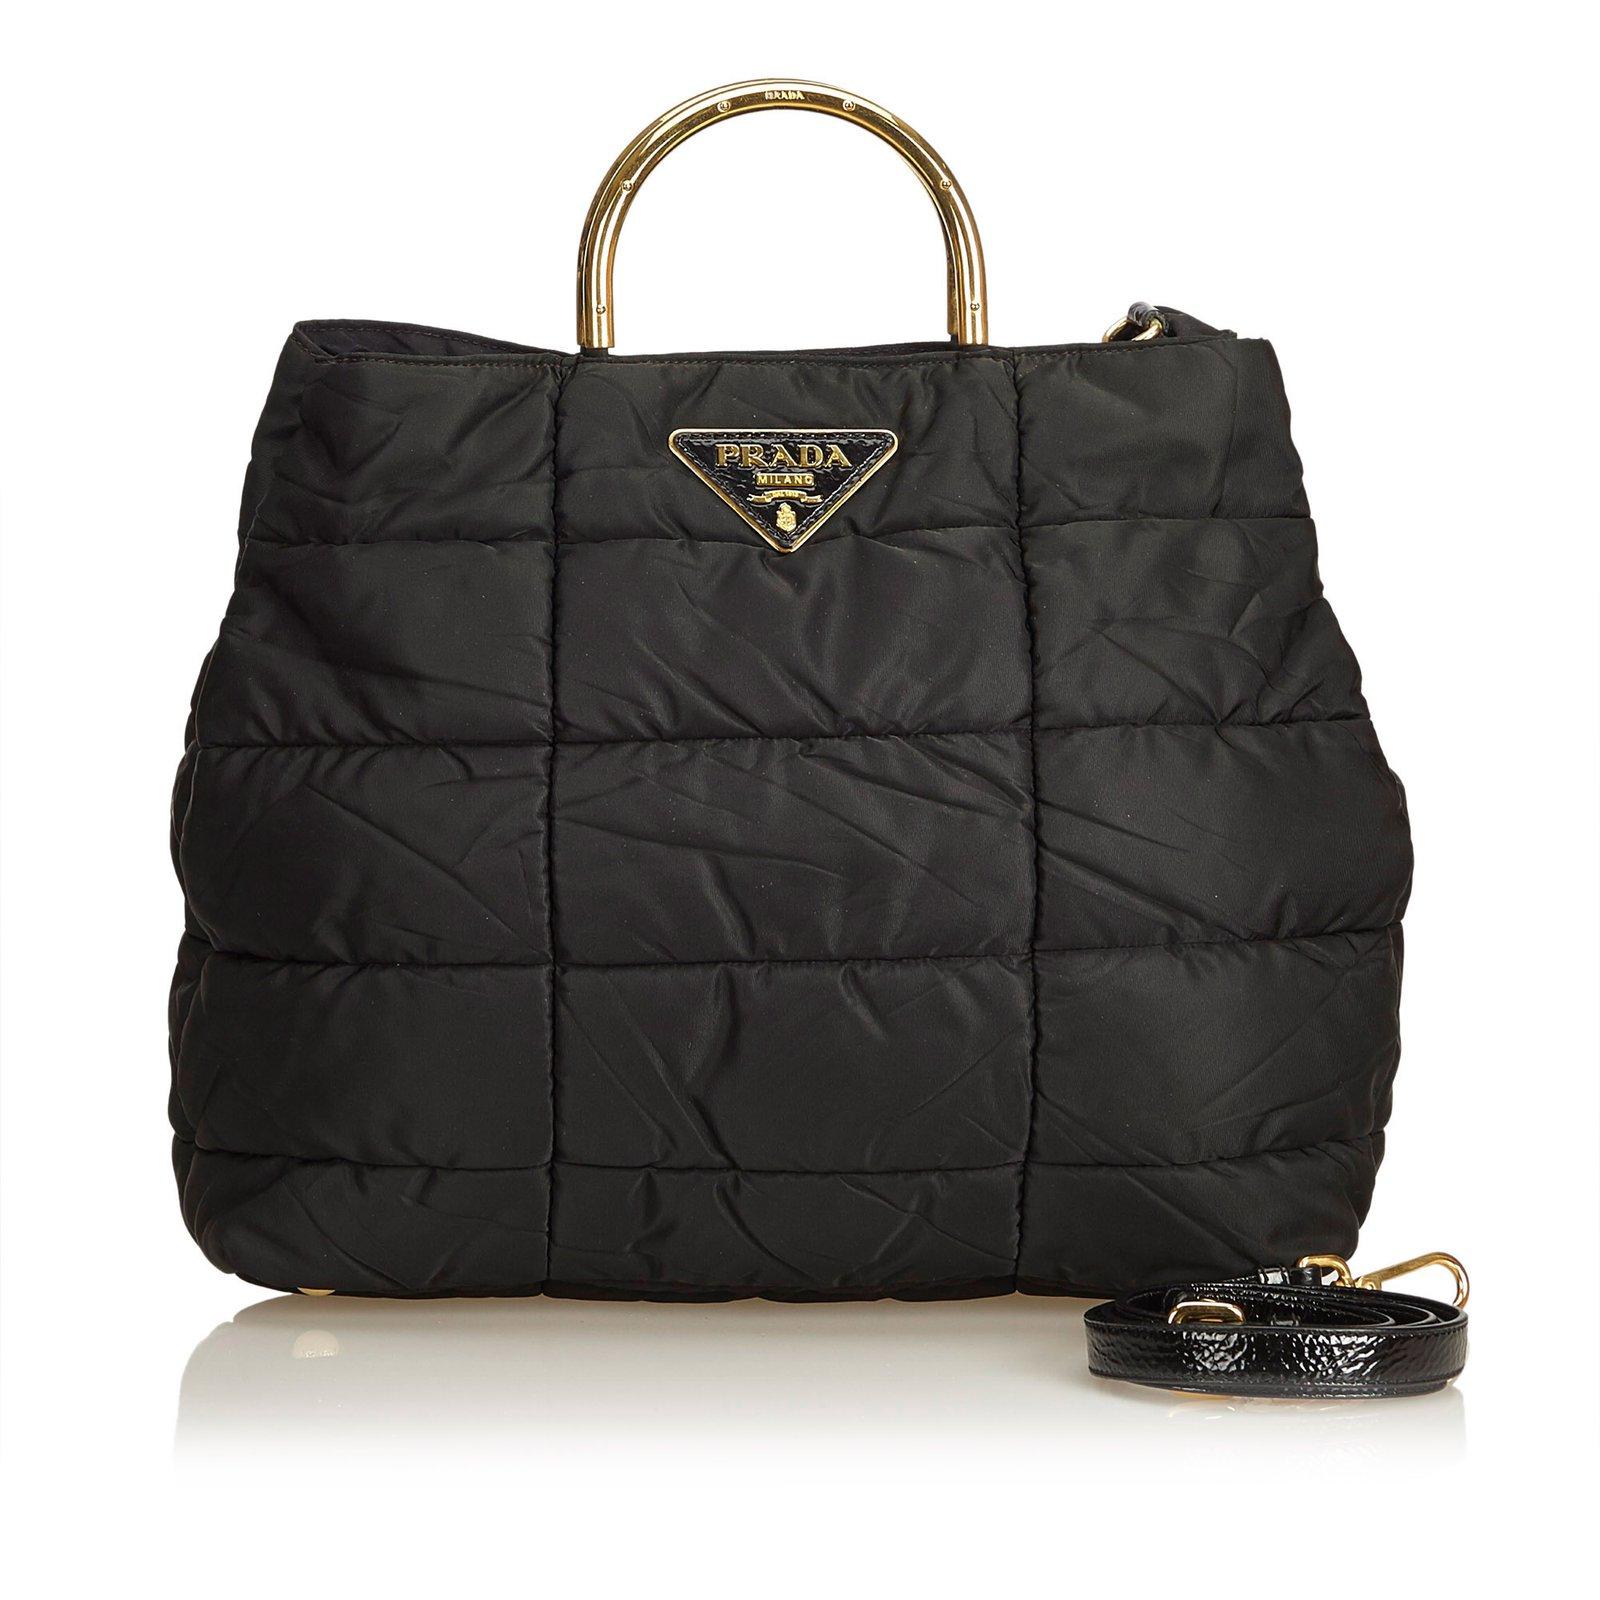 3cda981a44f5 Prada Quilted Nylon Satchel Handbags Leather,Patent leather,Nylon,Cloth  Black ref.